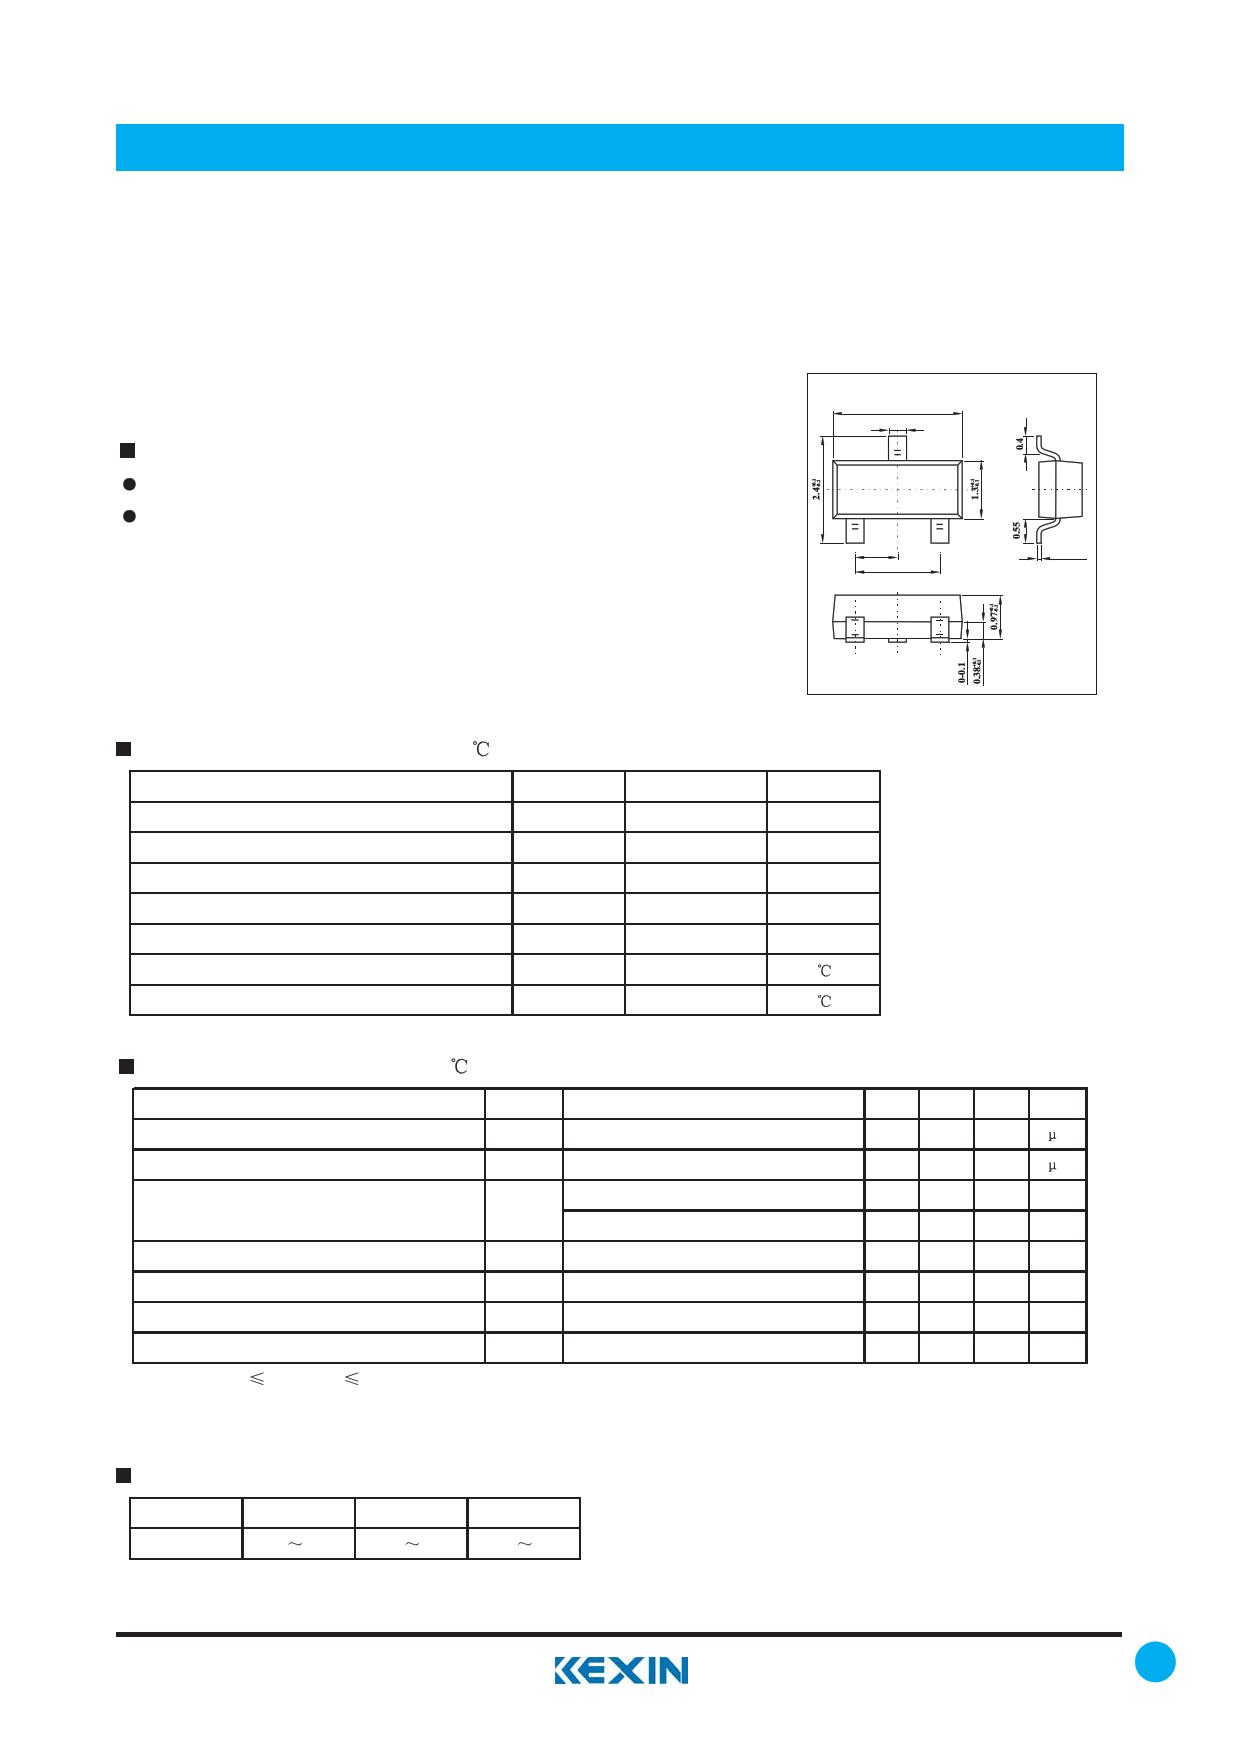 2SC1653 datasheet